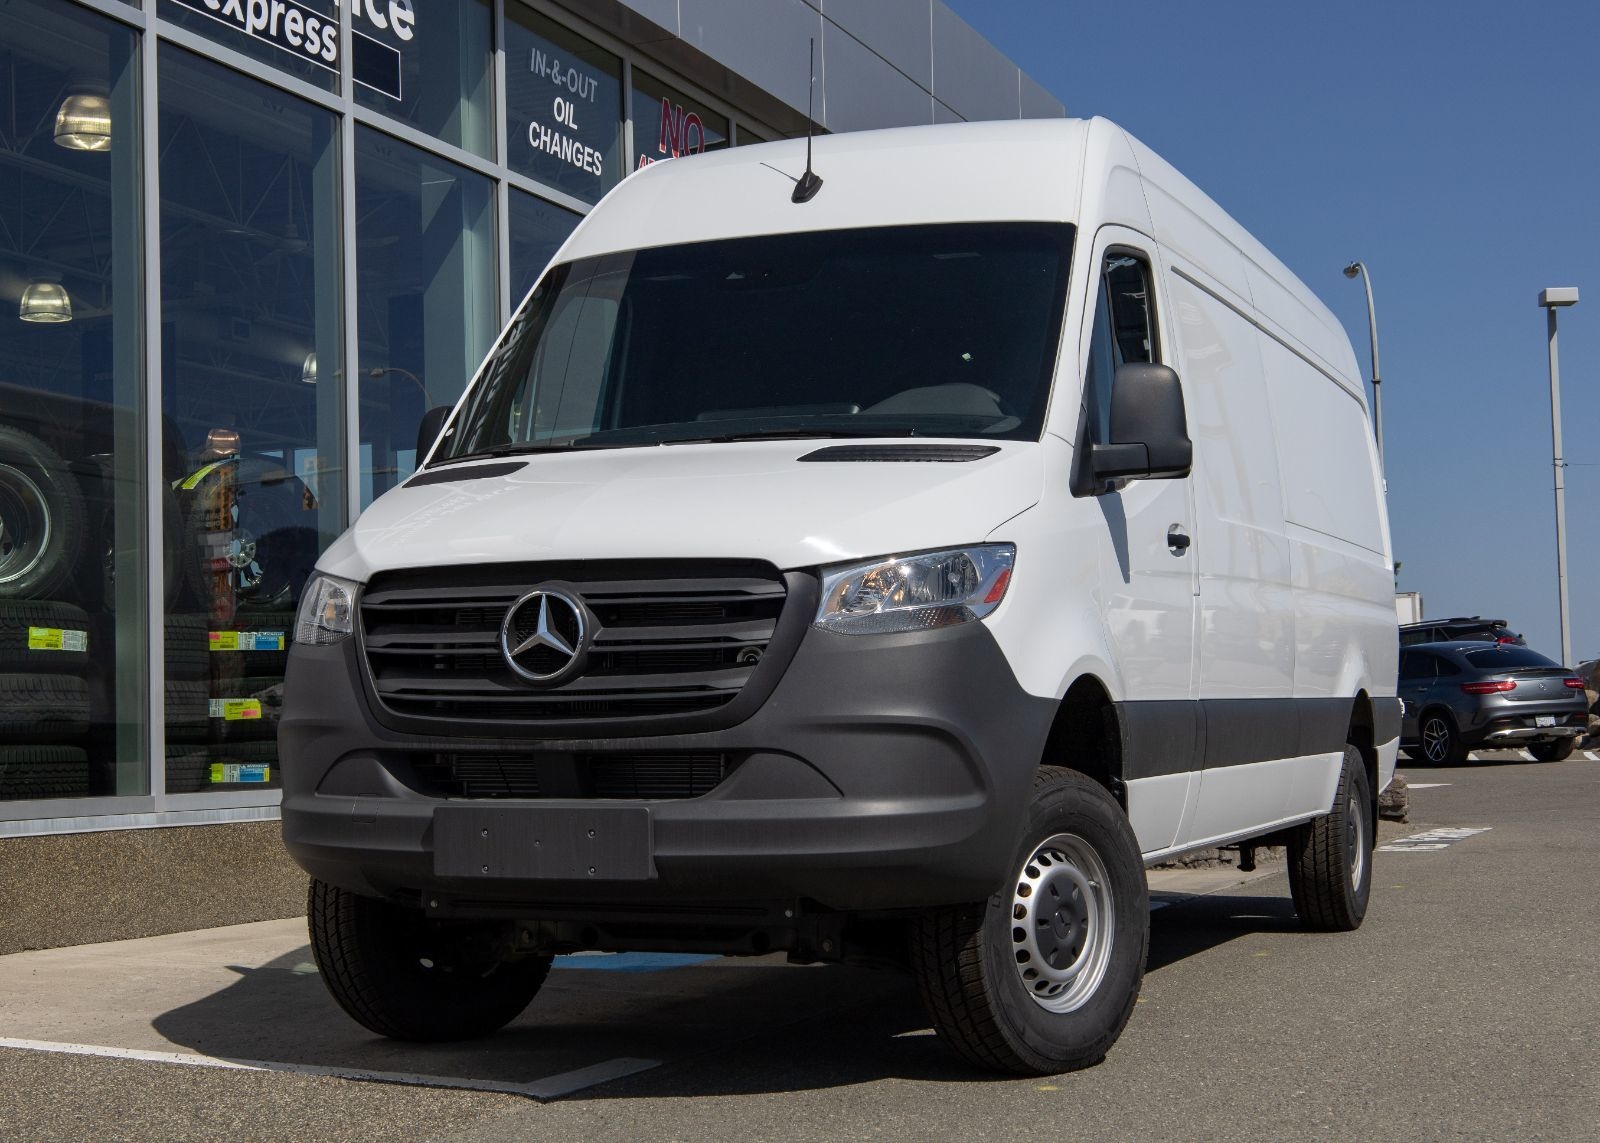 Mercedes Benz Kamloops New 2019 Mercedes Benz Sprinter 4x4 2500 Cargo 170 For Sale 72 998